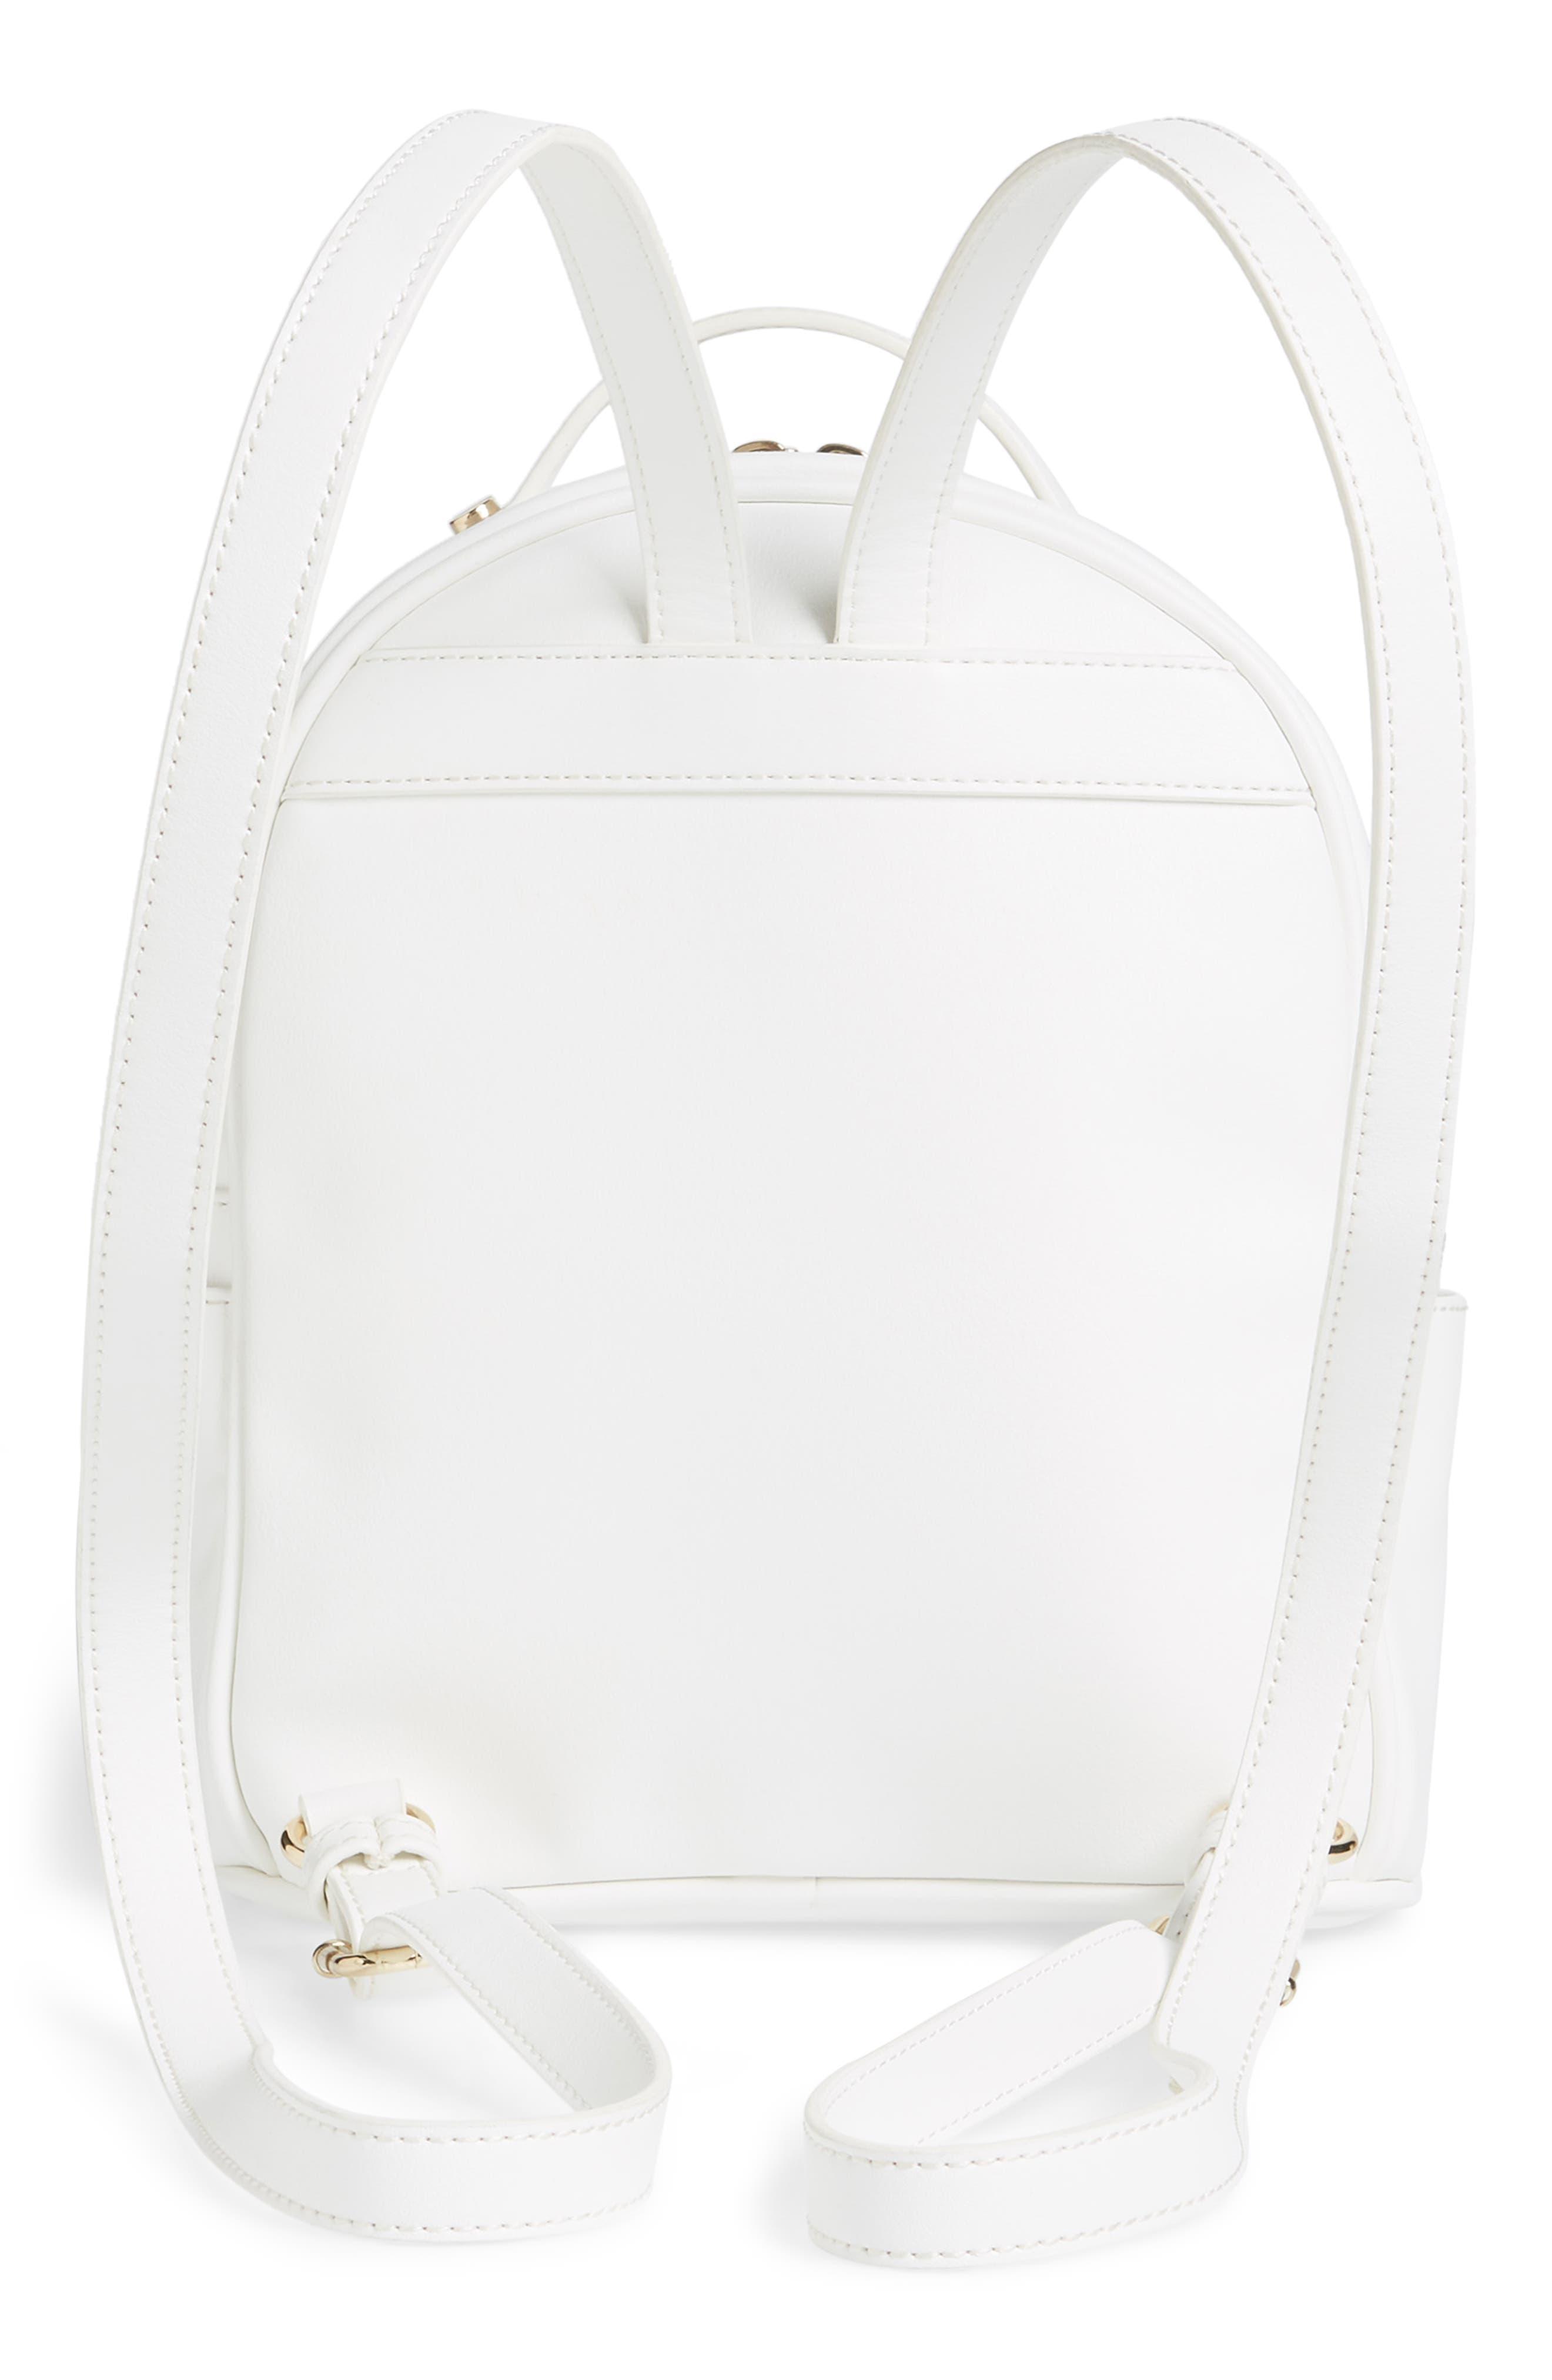 Mali + Lili Harper Lili Basket Weave Backpack,                             Alternate thumbnail 3, color,                             White